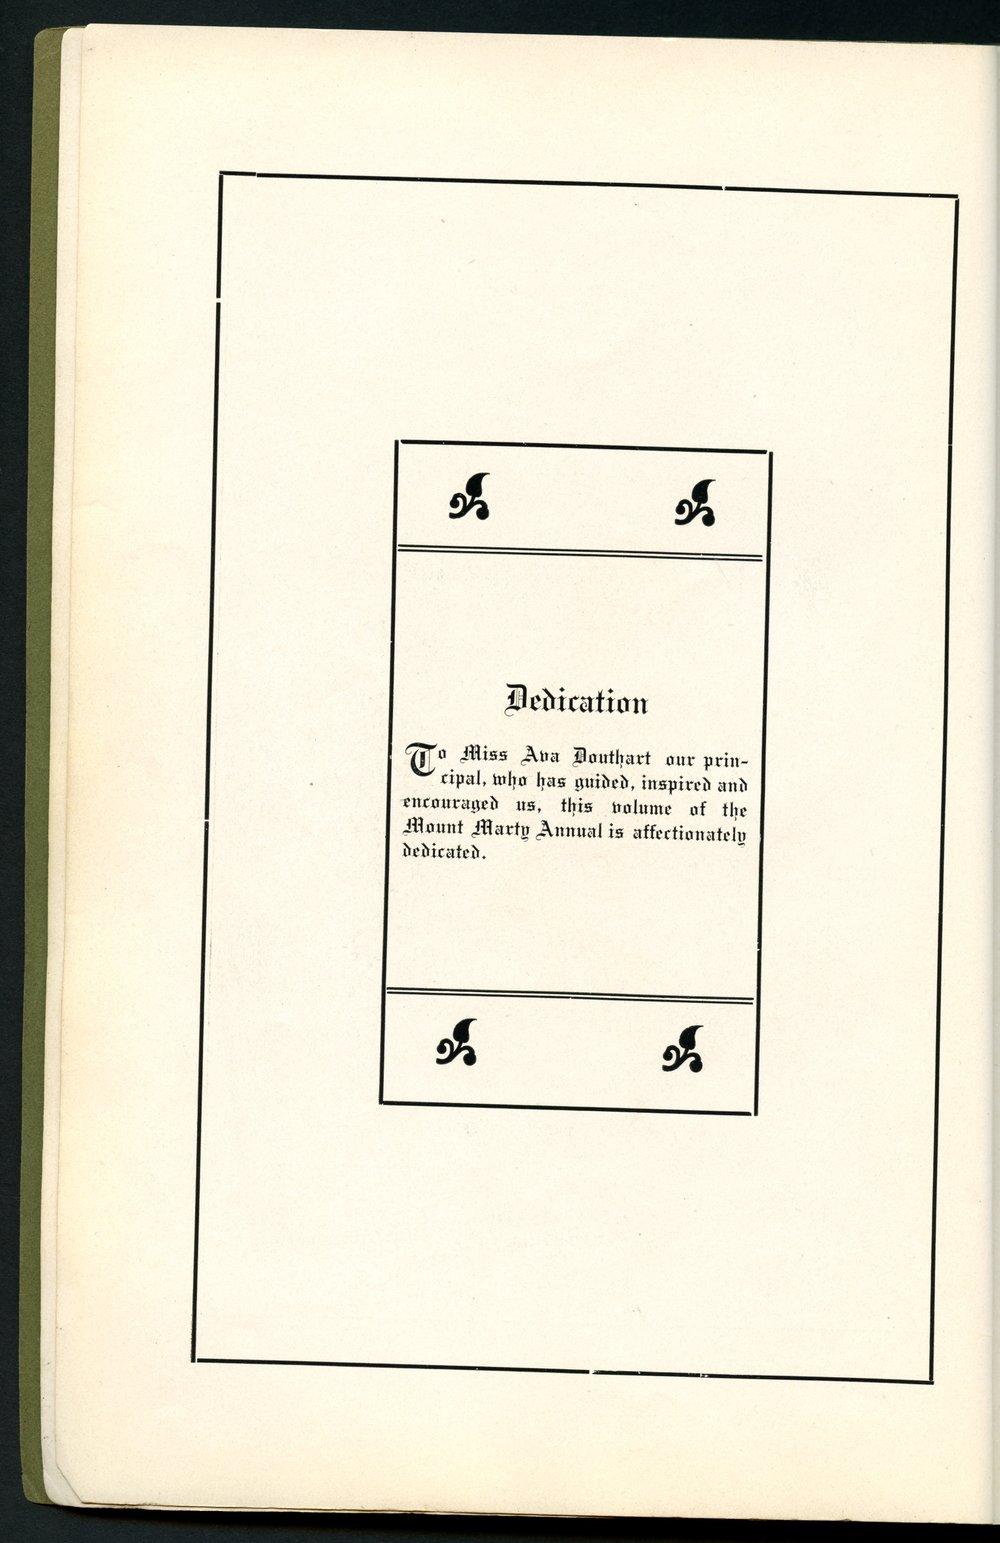 Mount Marty yearbook, 1910, Rosedale, Kansas - 4